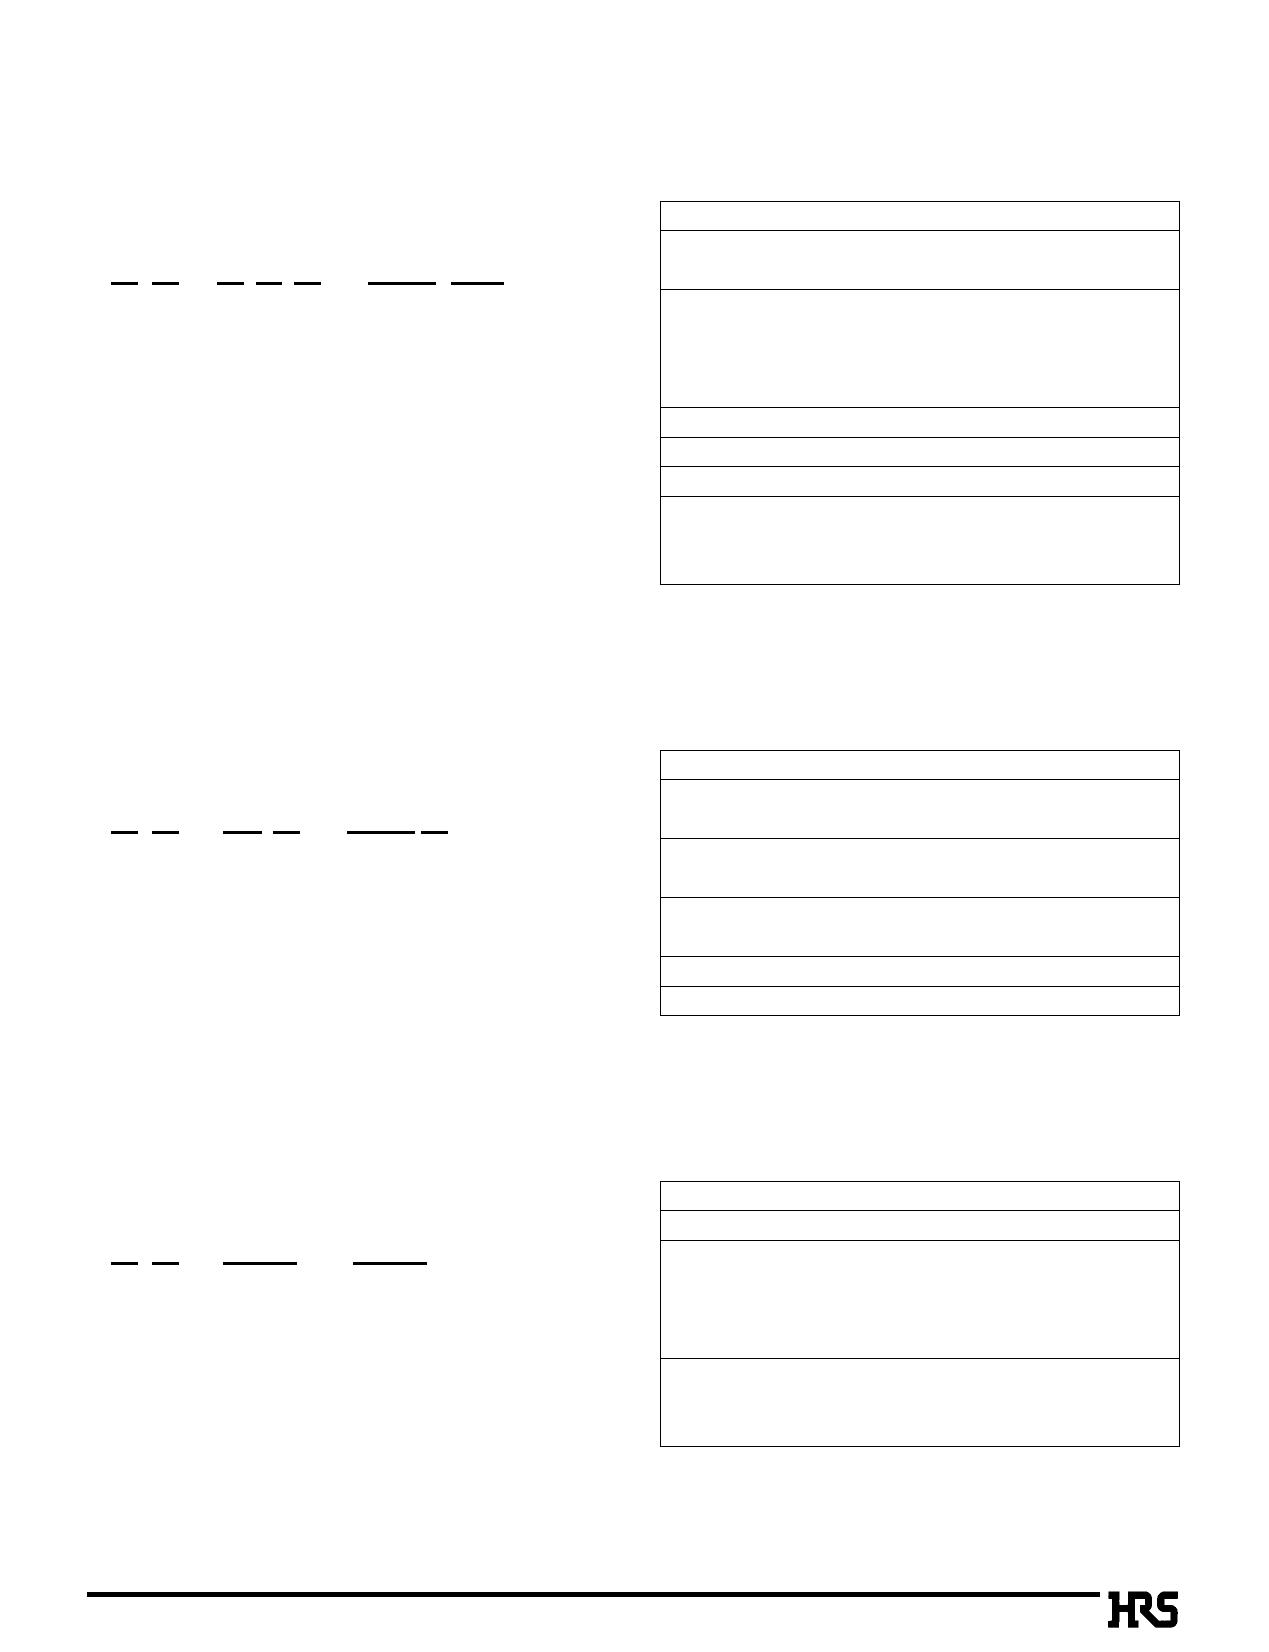 A1-10PA-2.54DSA pdf, schematic